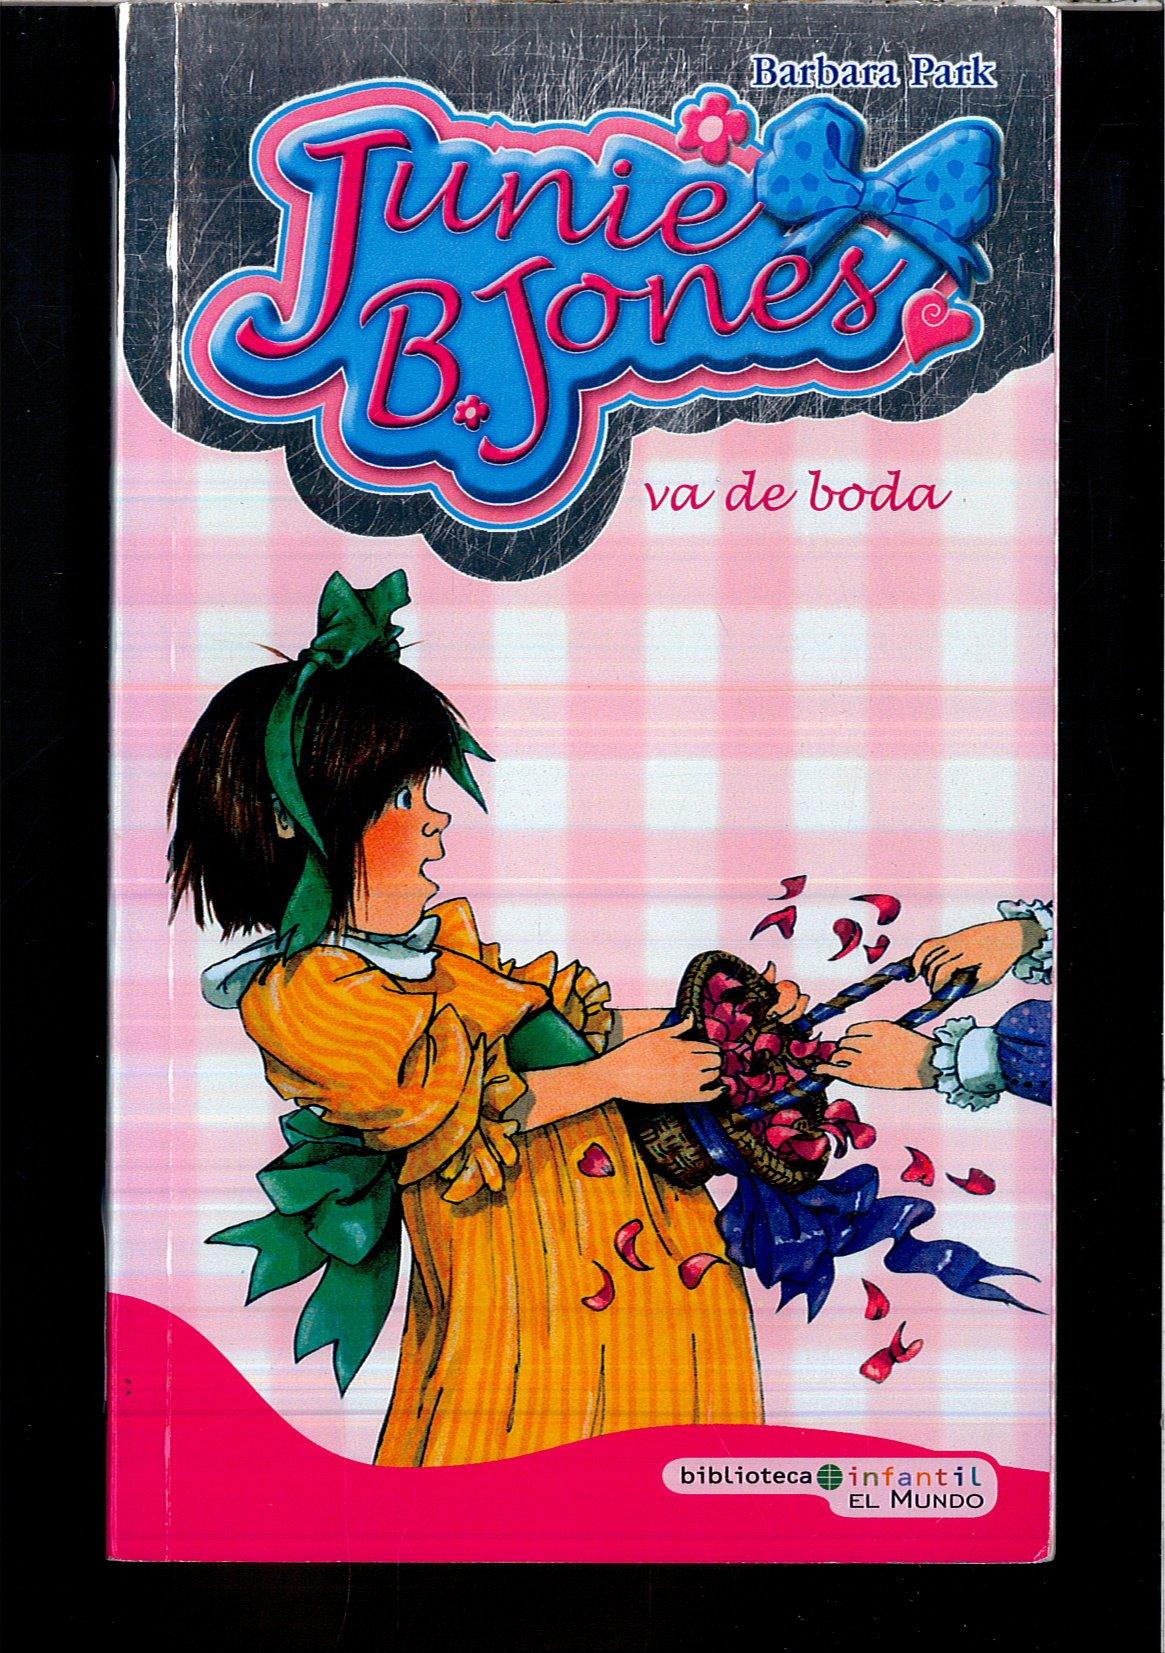 Junie B Jones Va De Boda 9788496878686 Books Amazon Ca